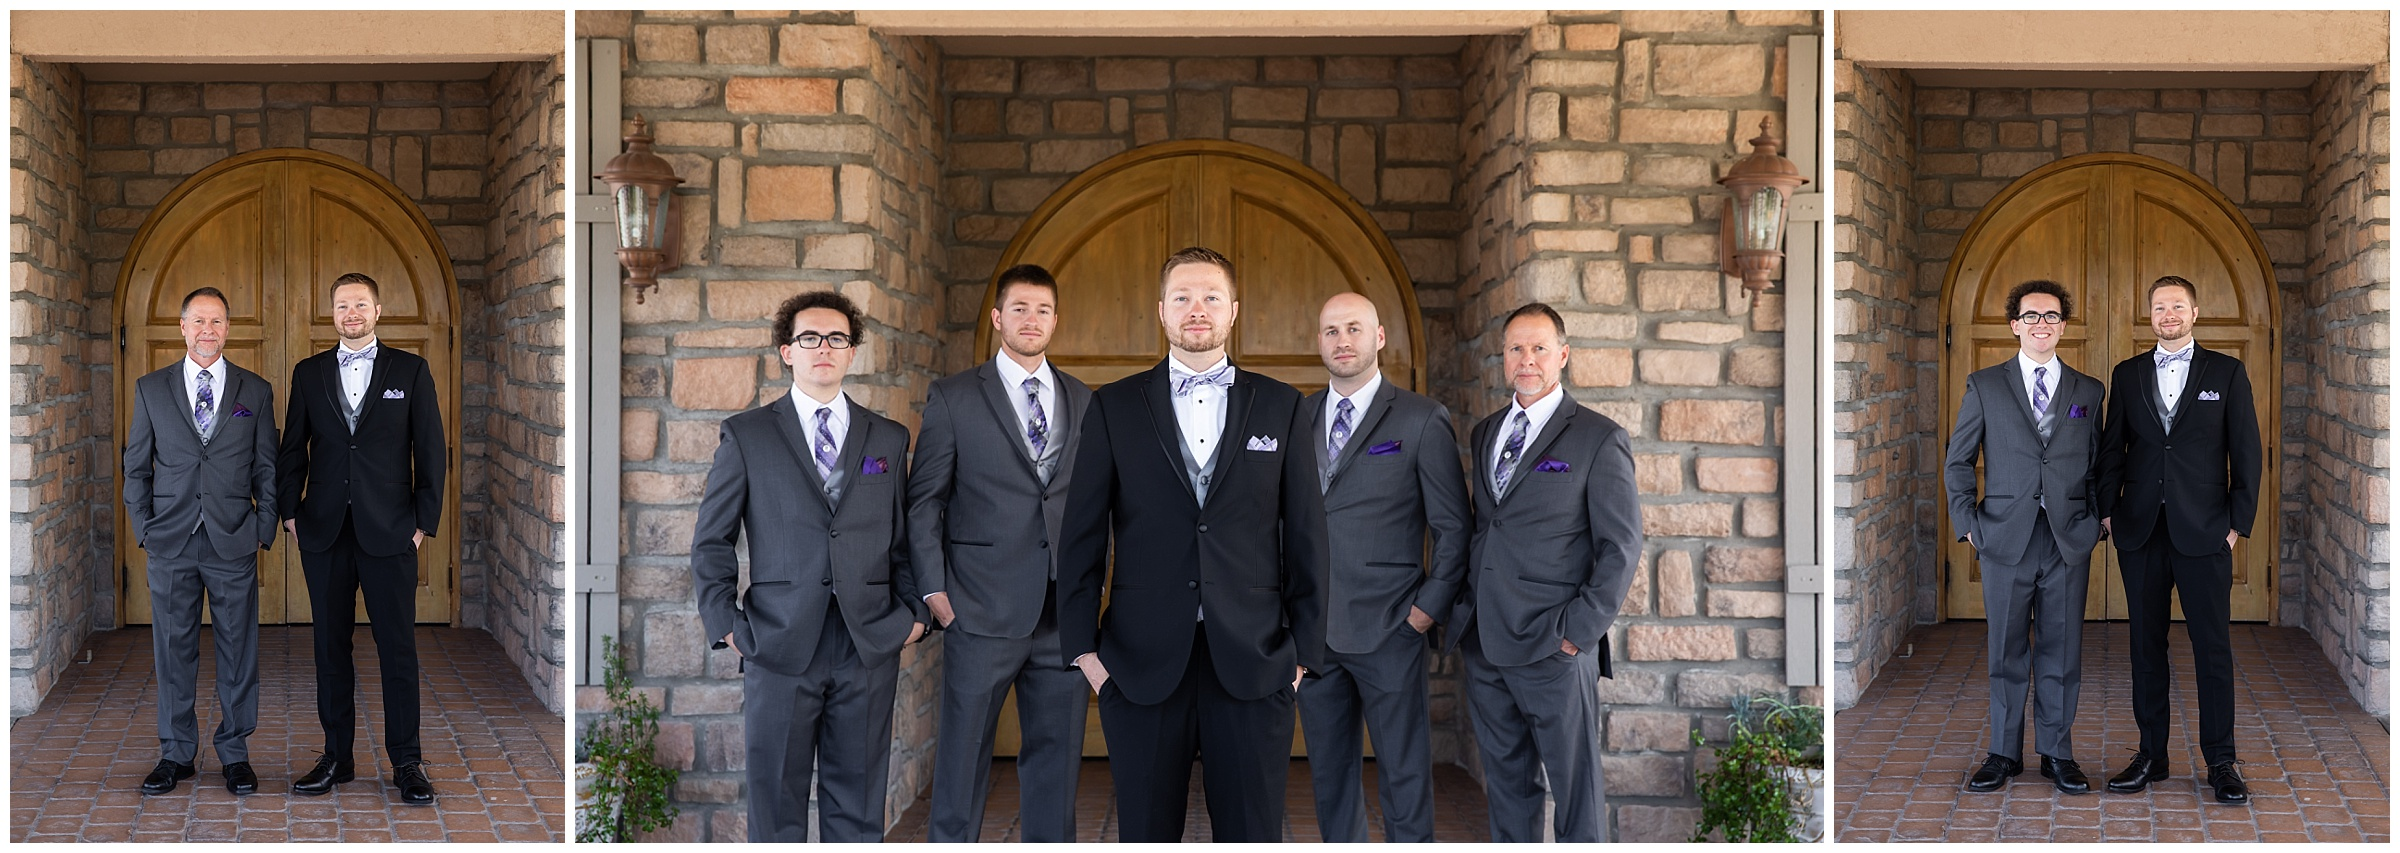 Grand Junction Wedding Photographer 0016.jpg